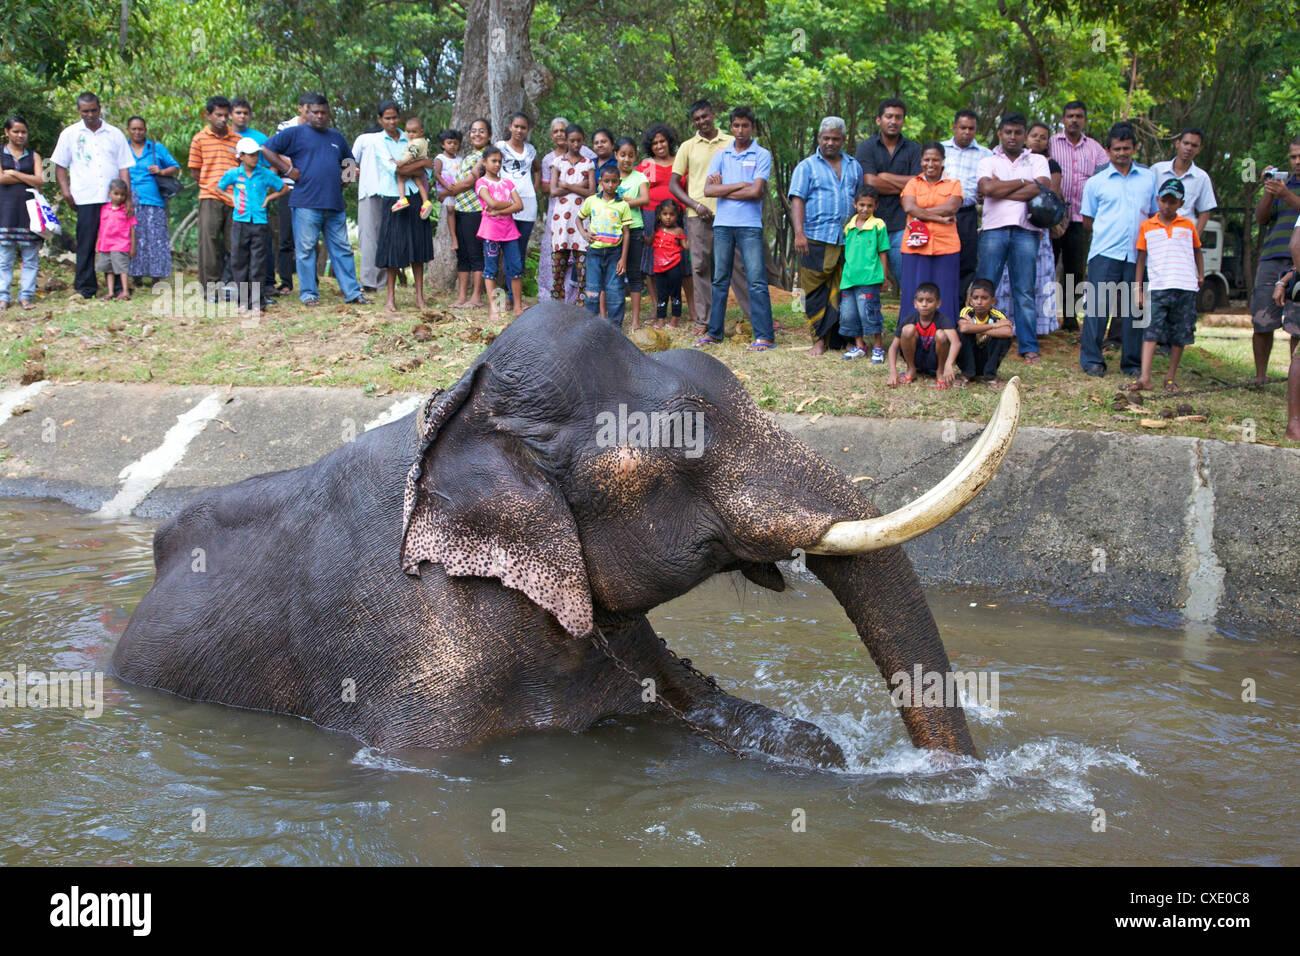 Captive Asiatic elephant (Elephas maximus maximus) in Colombo prior to the Perahera, Victoria Park, Colombo, Sri - Stock Image